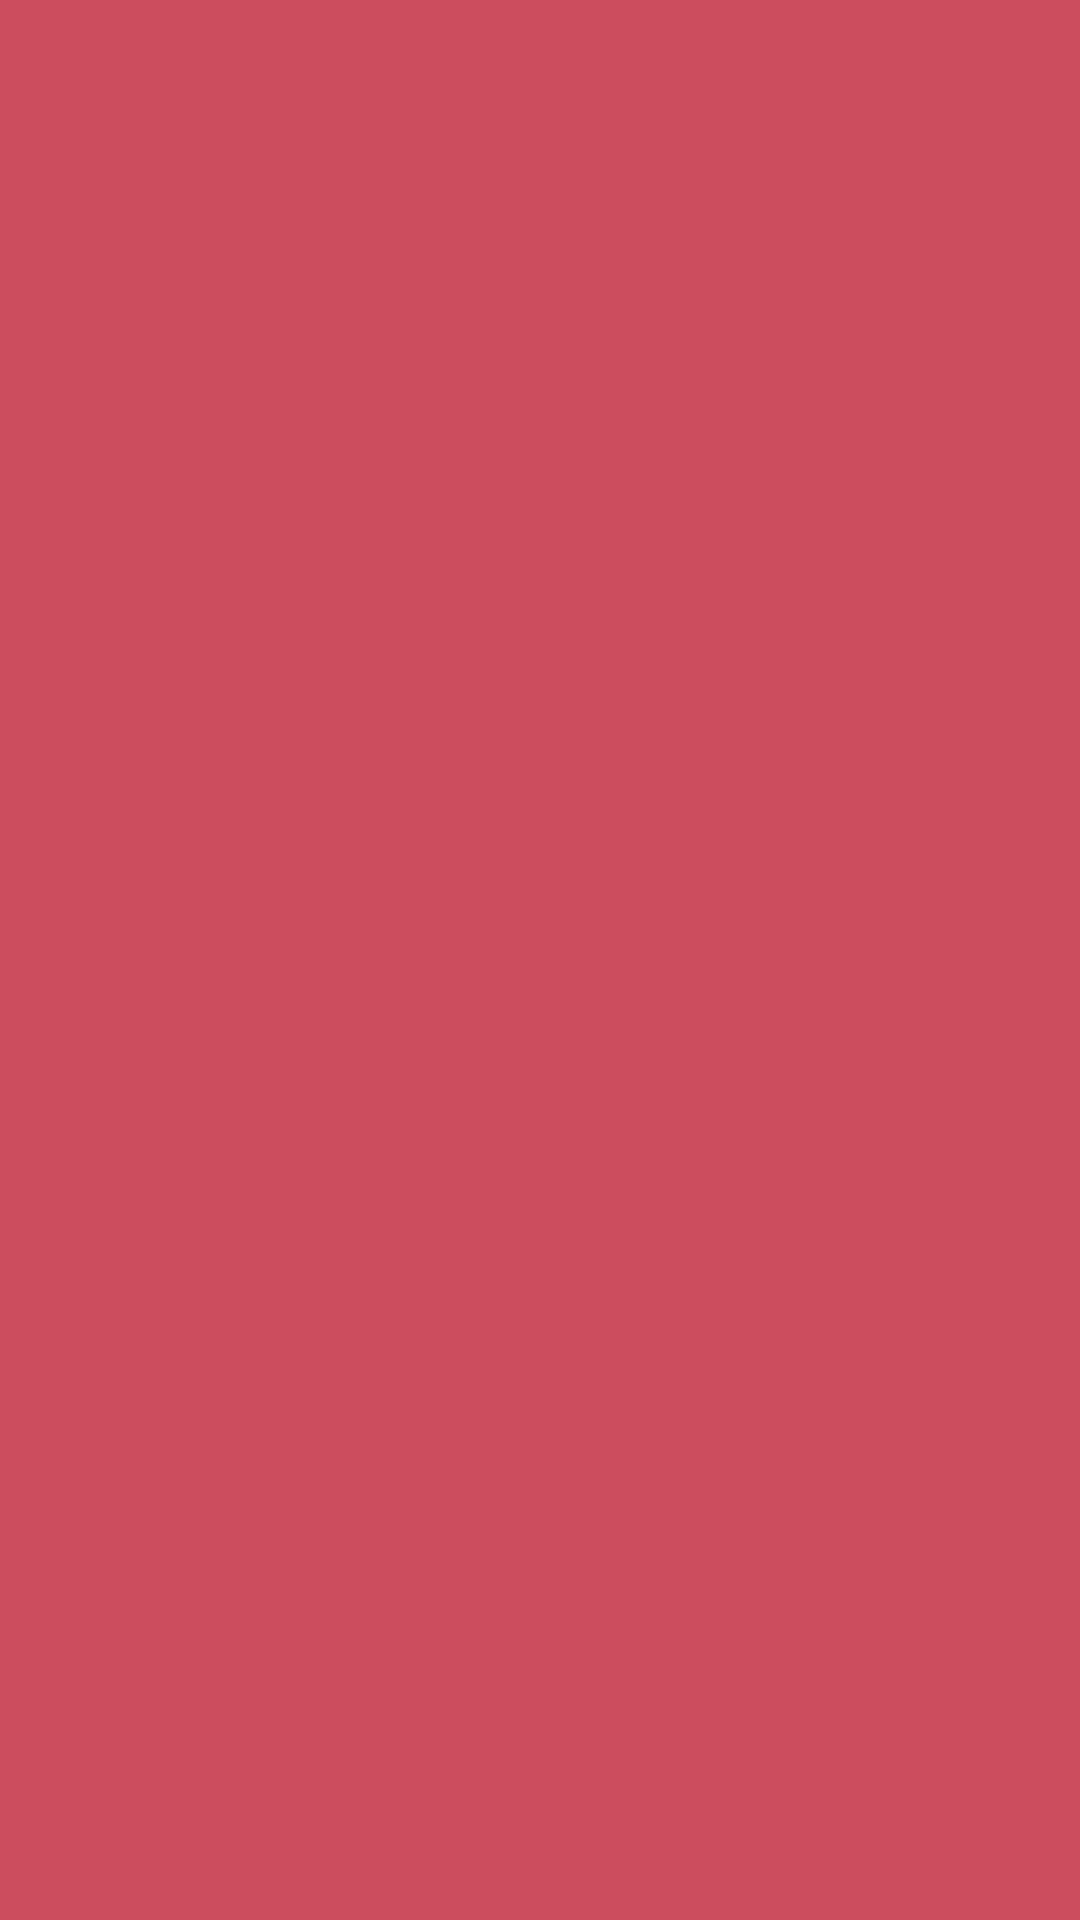 1080x1920 Dark Terra Cotta Solid Color Background